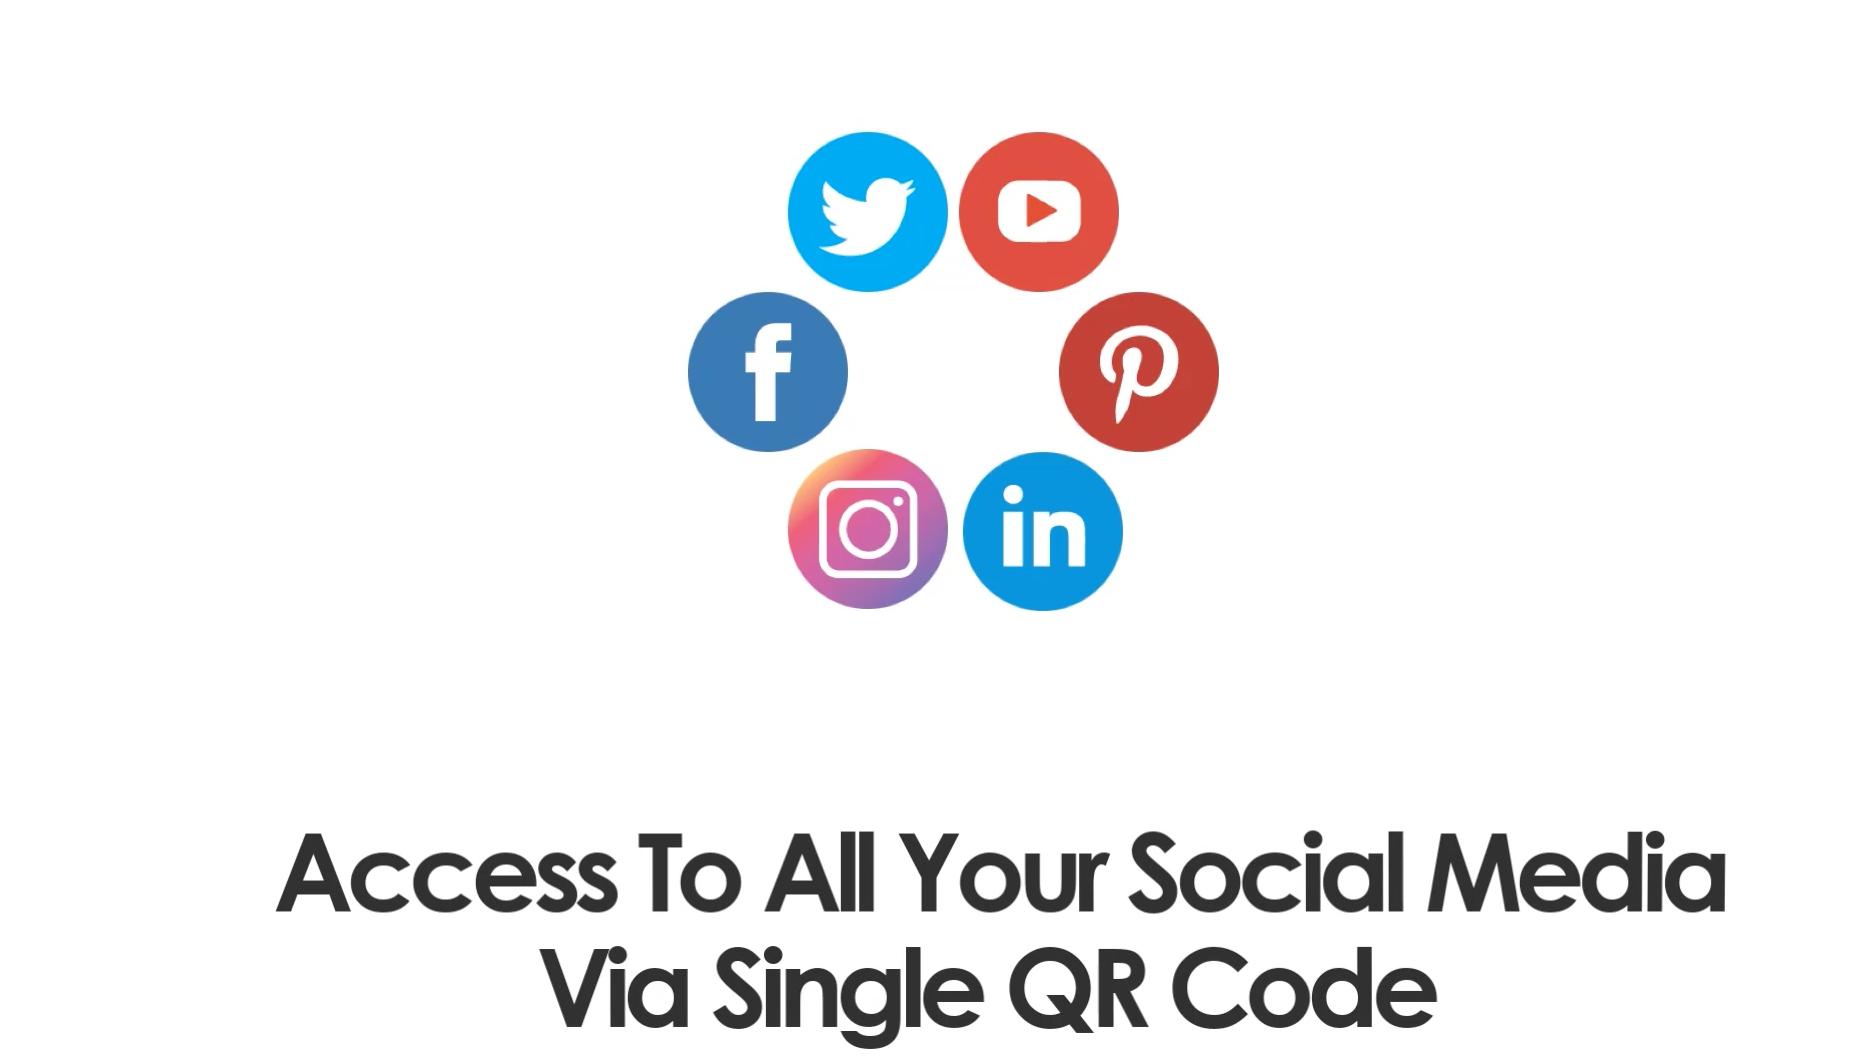 QR code for Social media - DocDrag